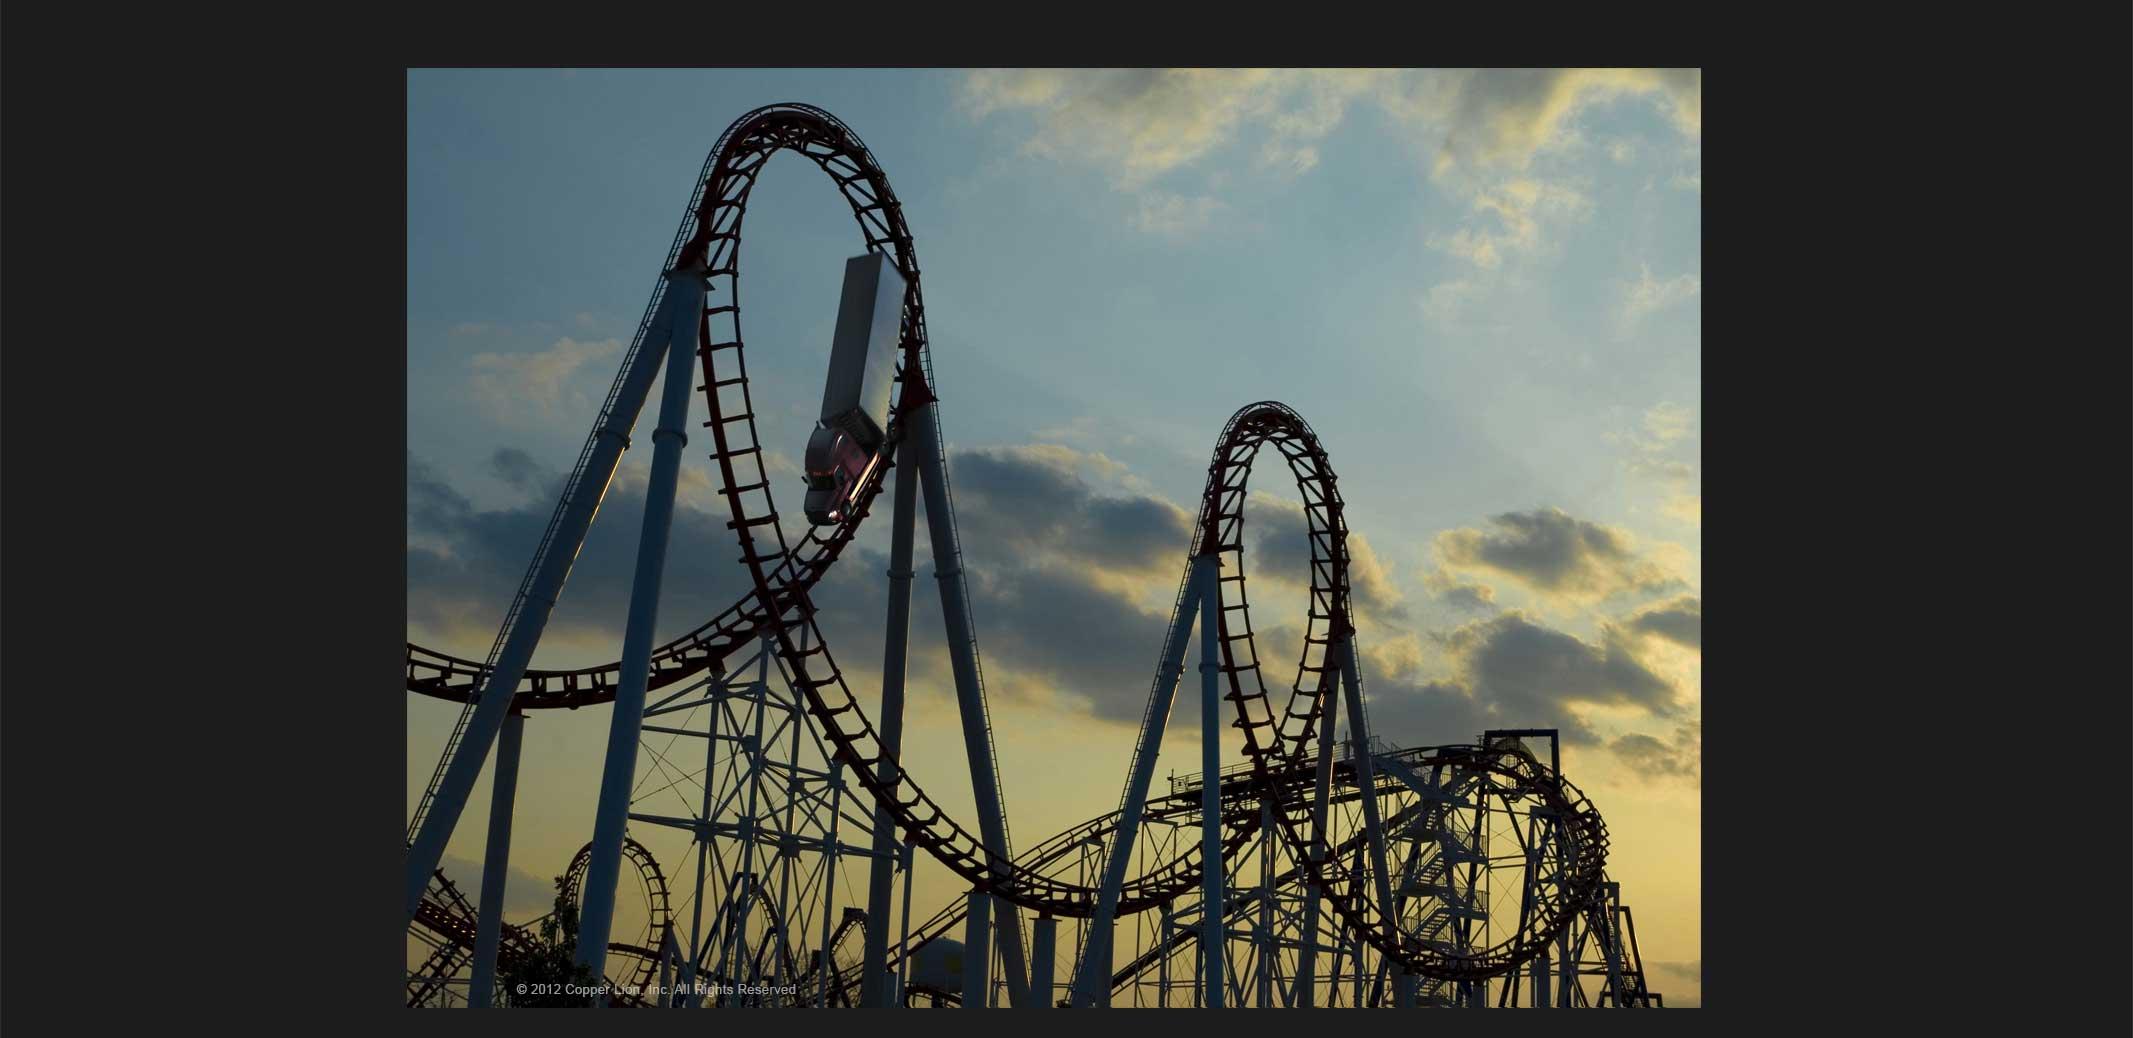 sl_roller_coaster